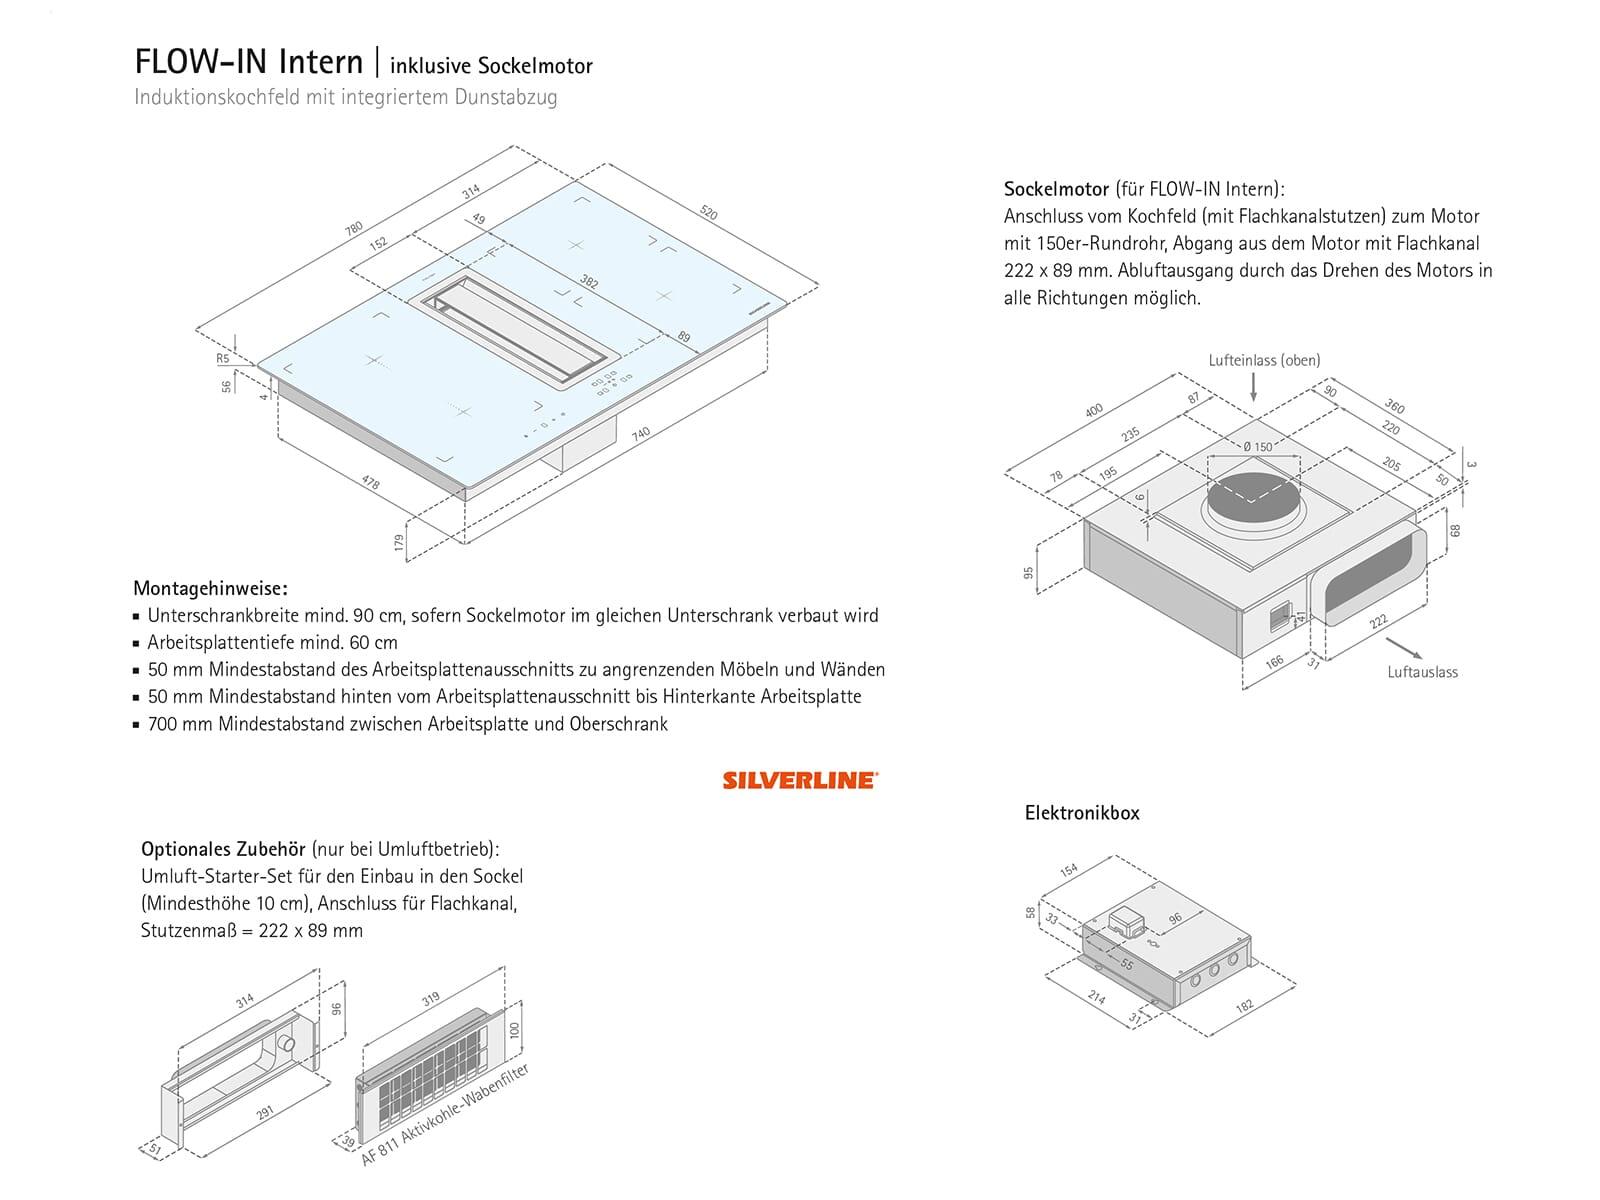 silverline flik 854 es flow in intern premium induktionskochfeld dunstabzug ebay. Black Bedroom Furniture Sets. Home Design Ideas